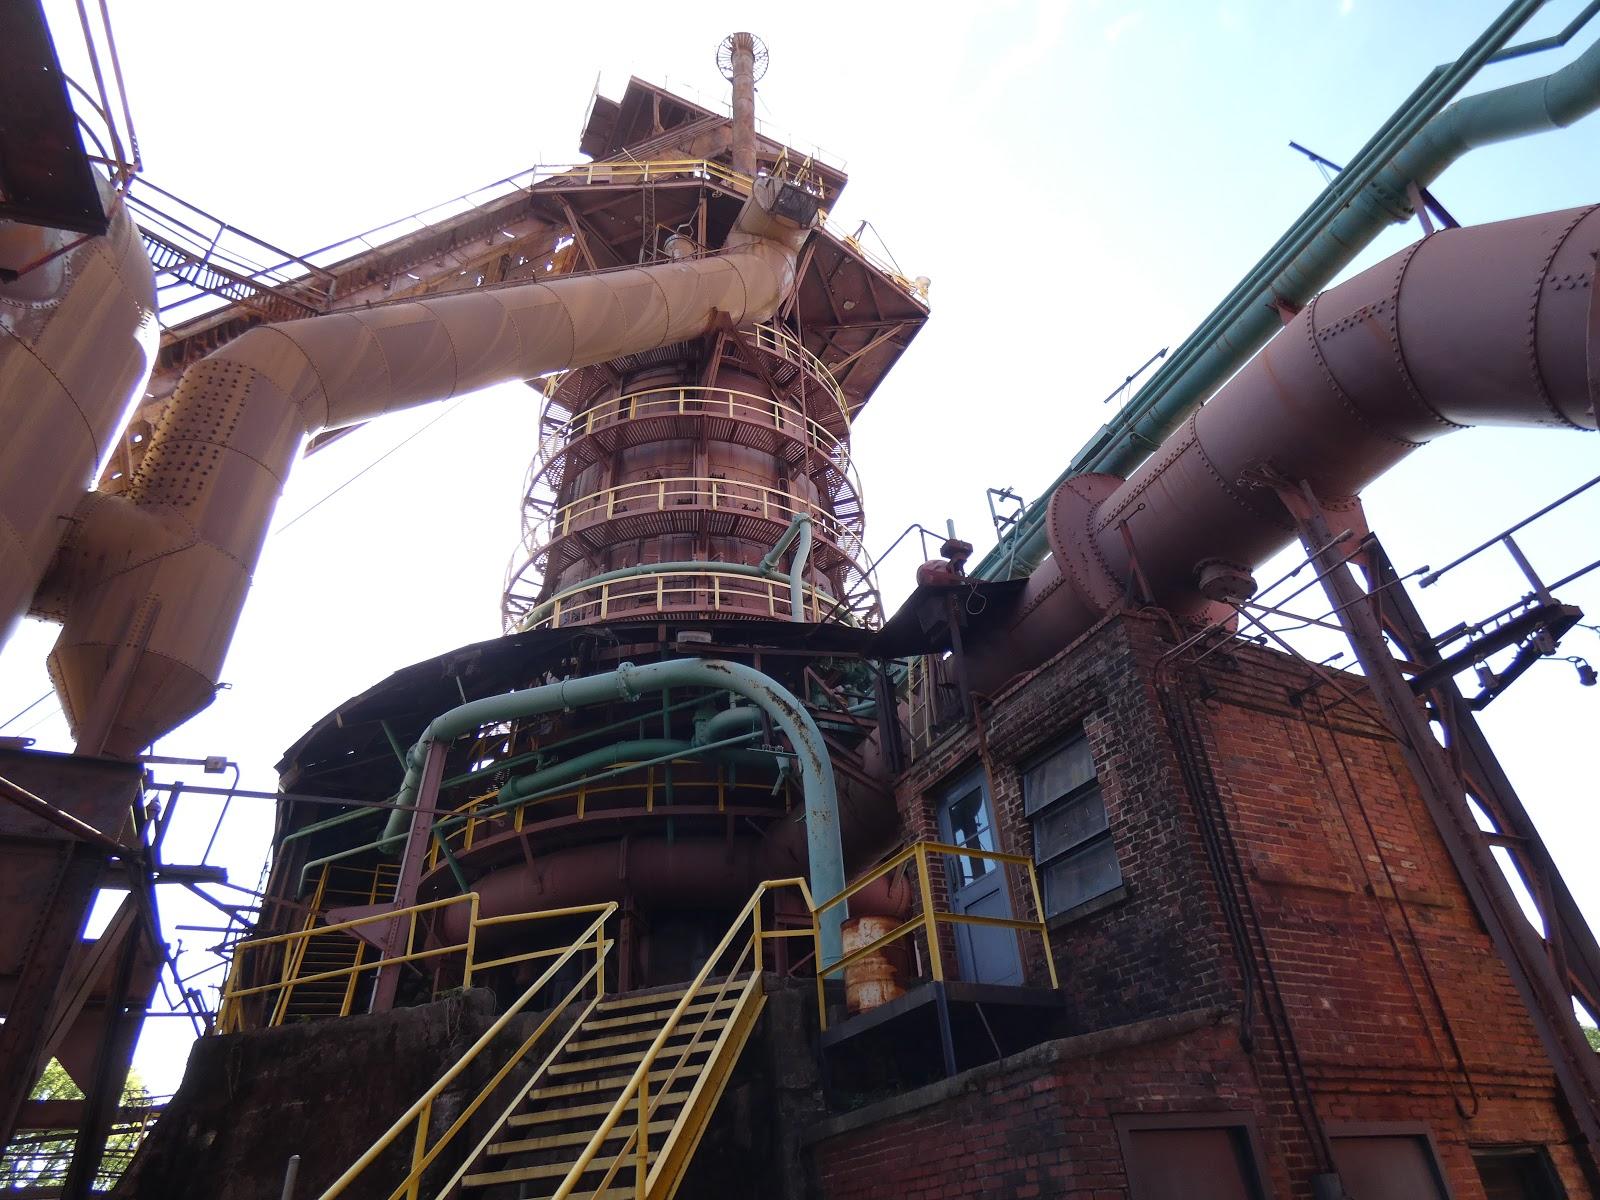 Blast Furnace Lime : Zippypinhead sloss furnace historic landmark